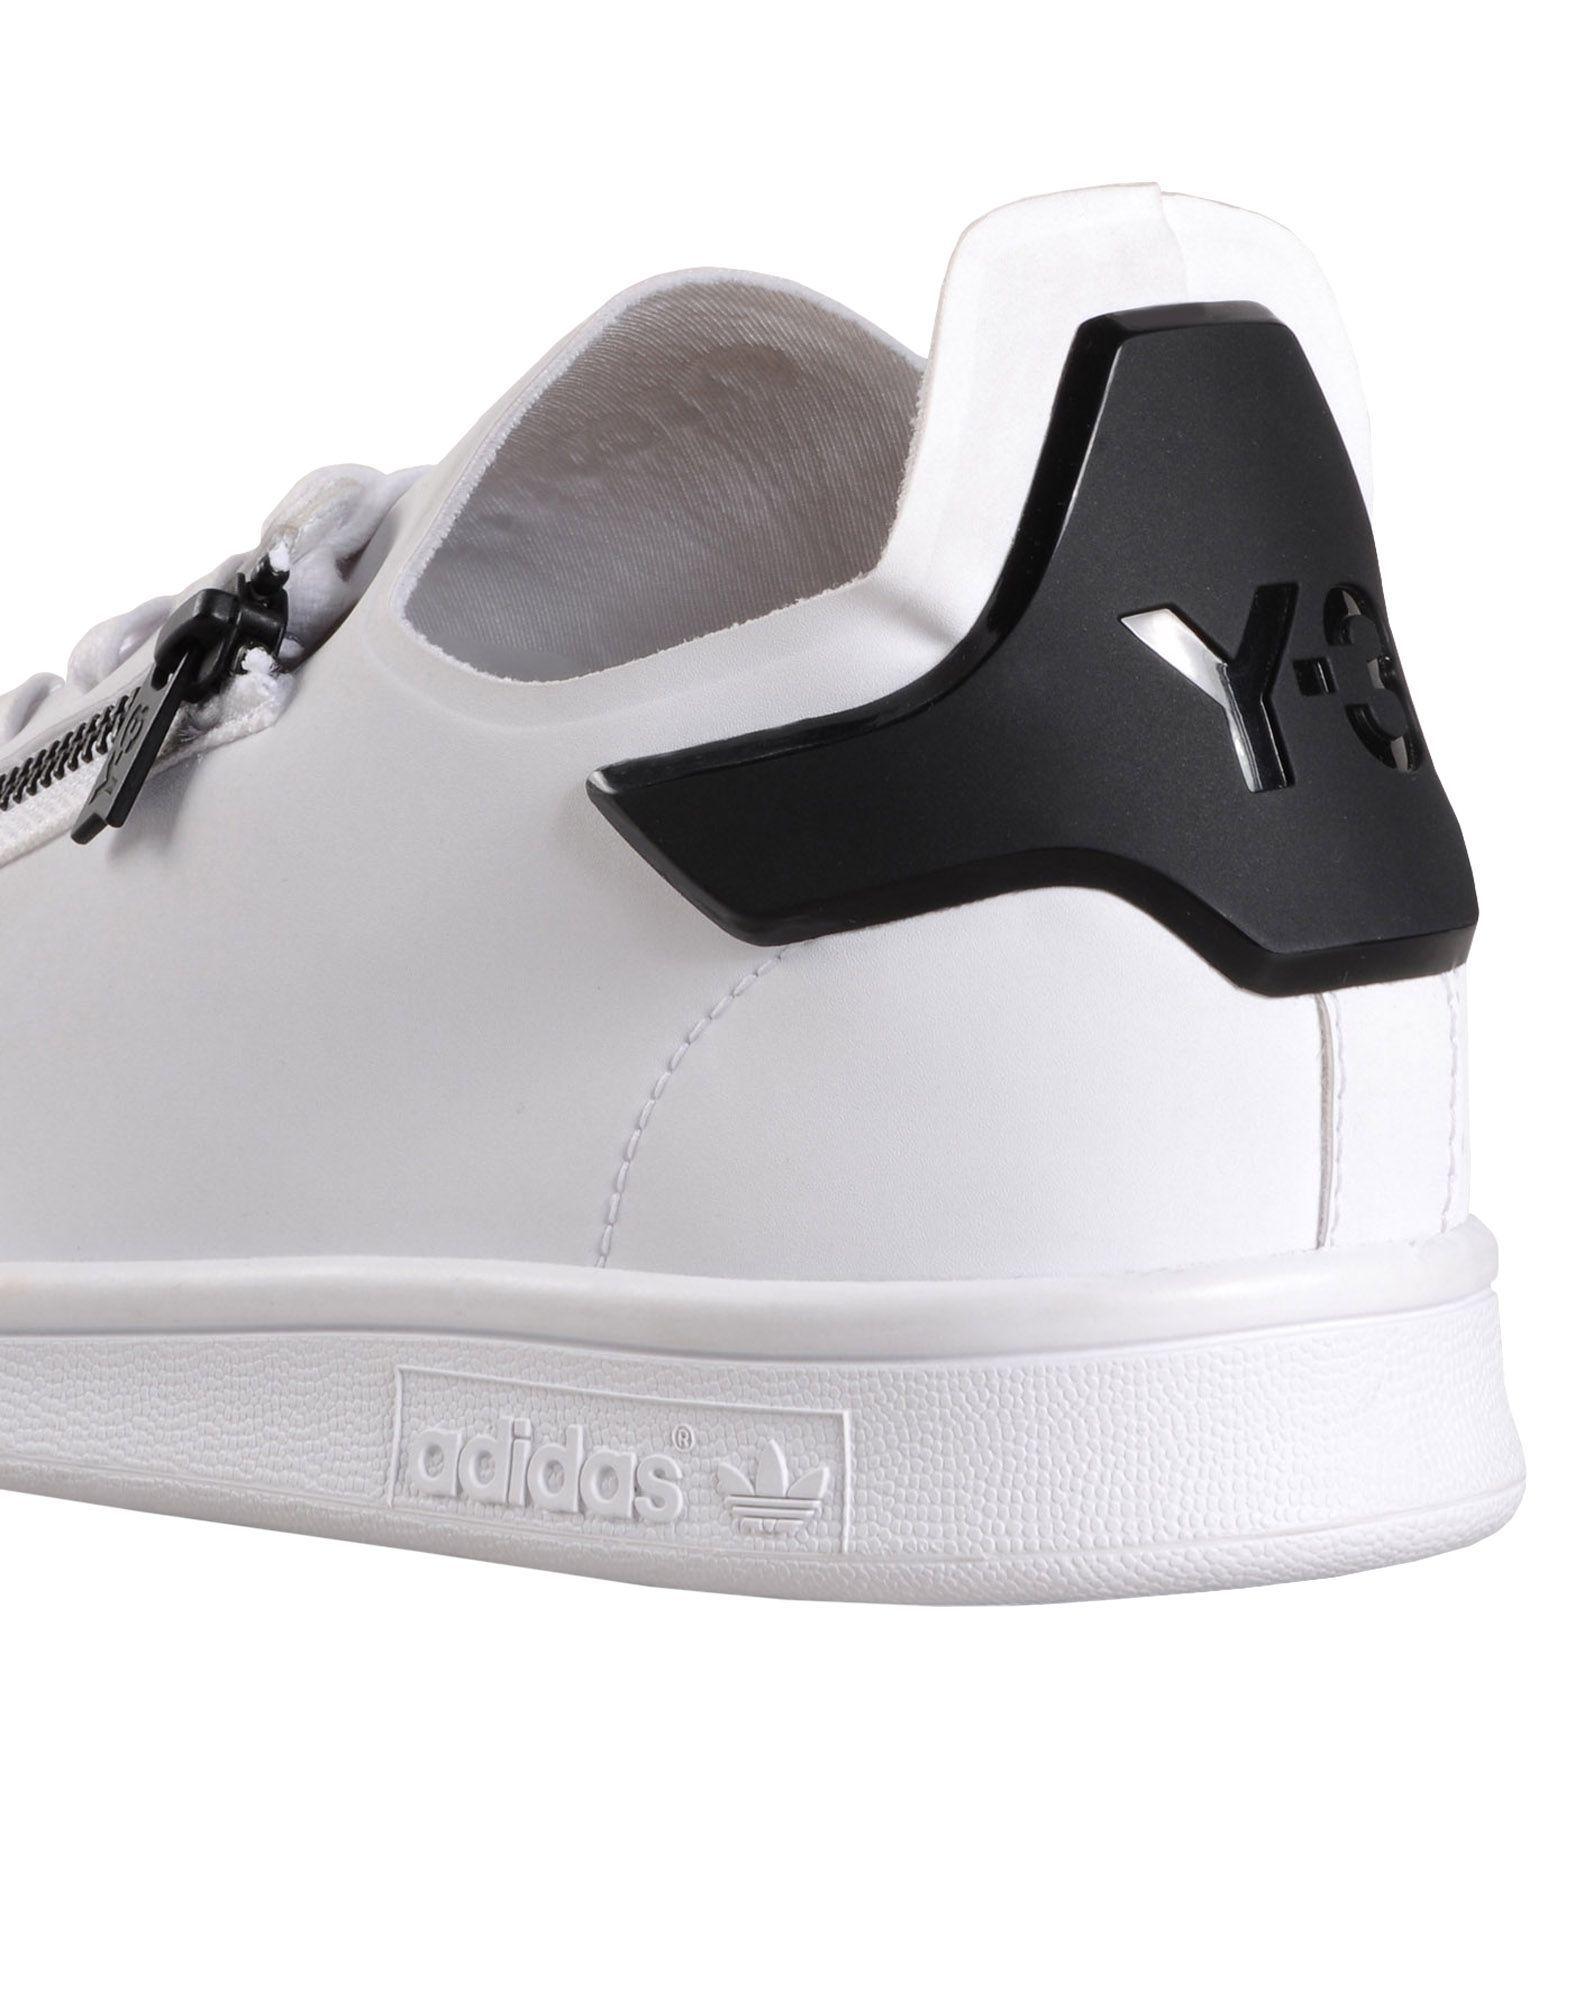 Y Zip Unisex 3 AdidasMif Chaussures Stan If6gmvbyY7